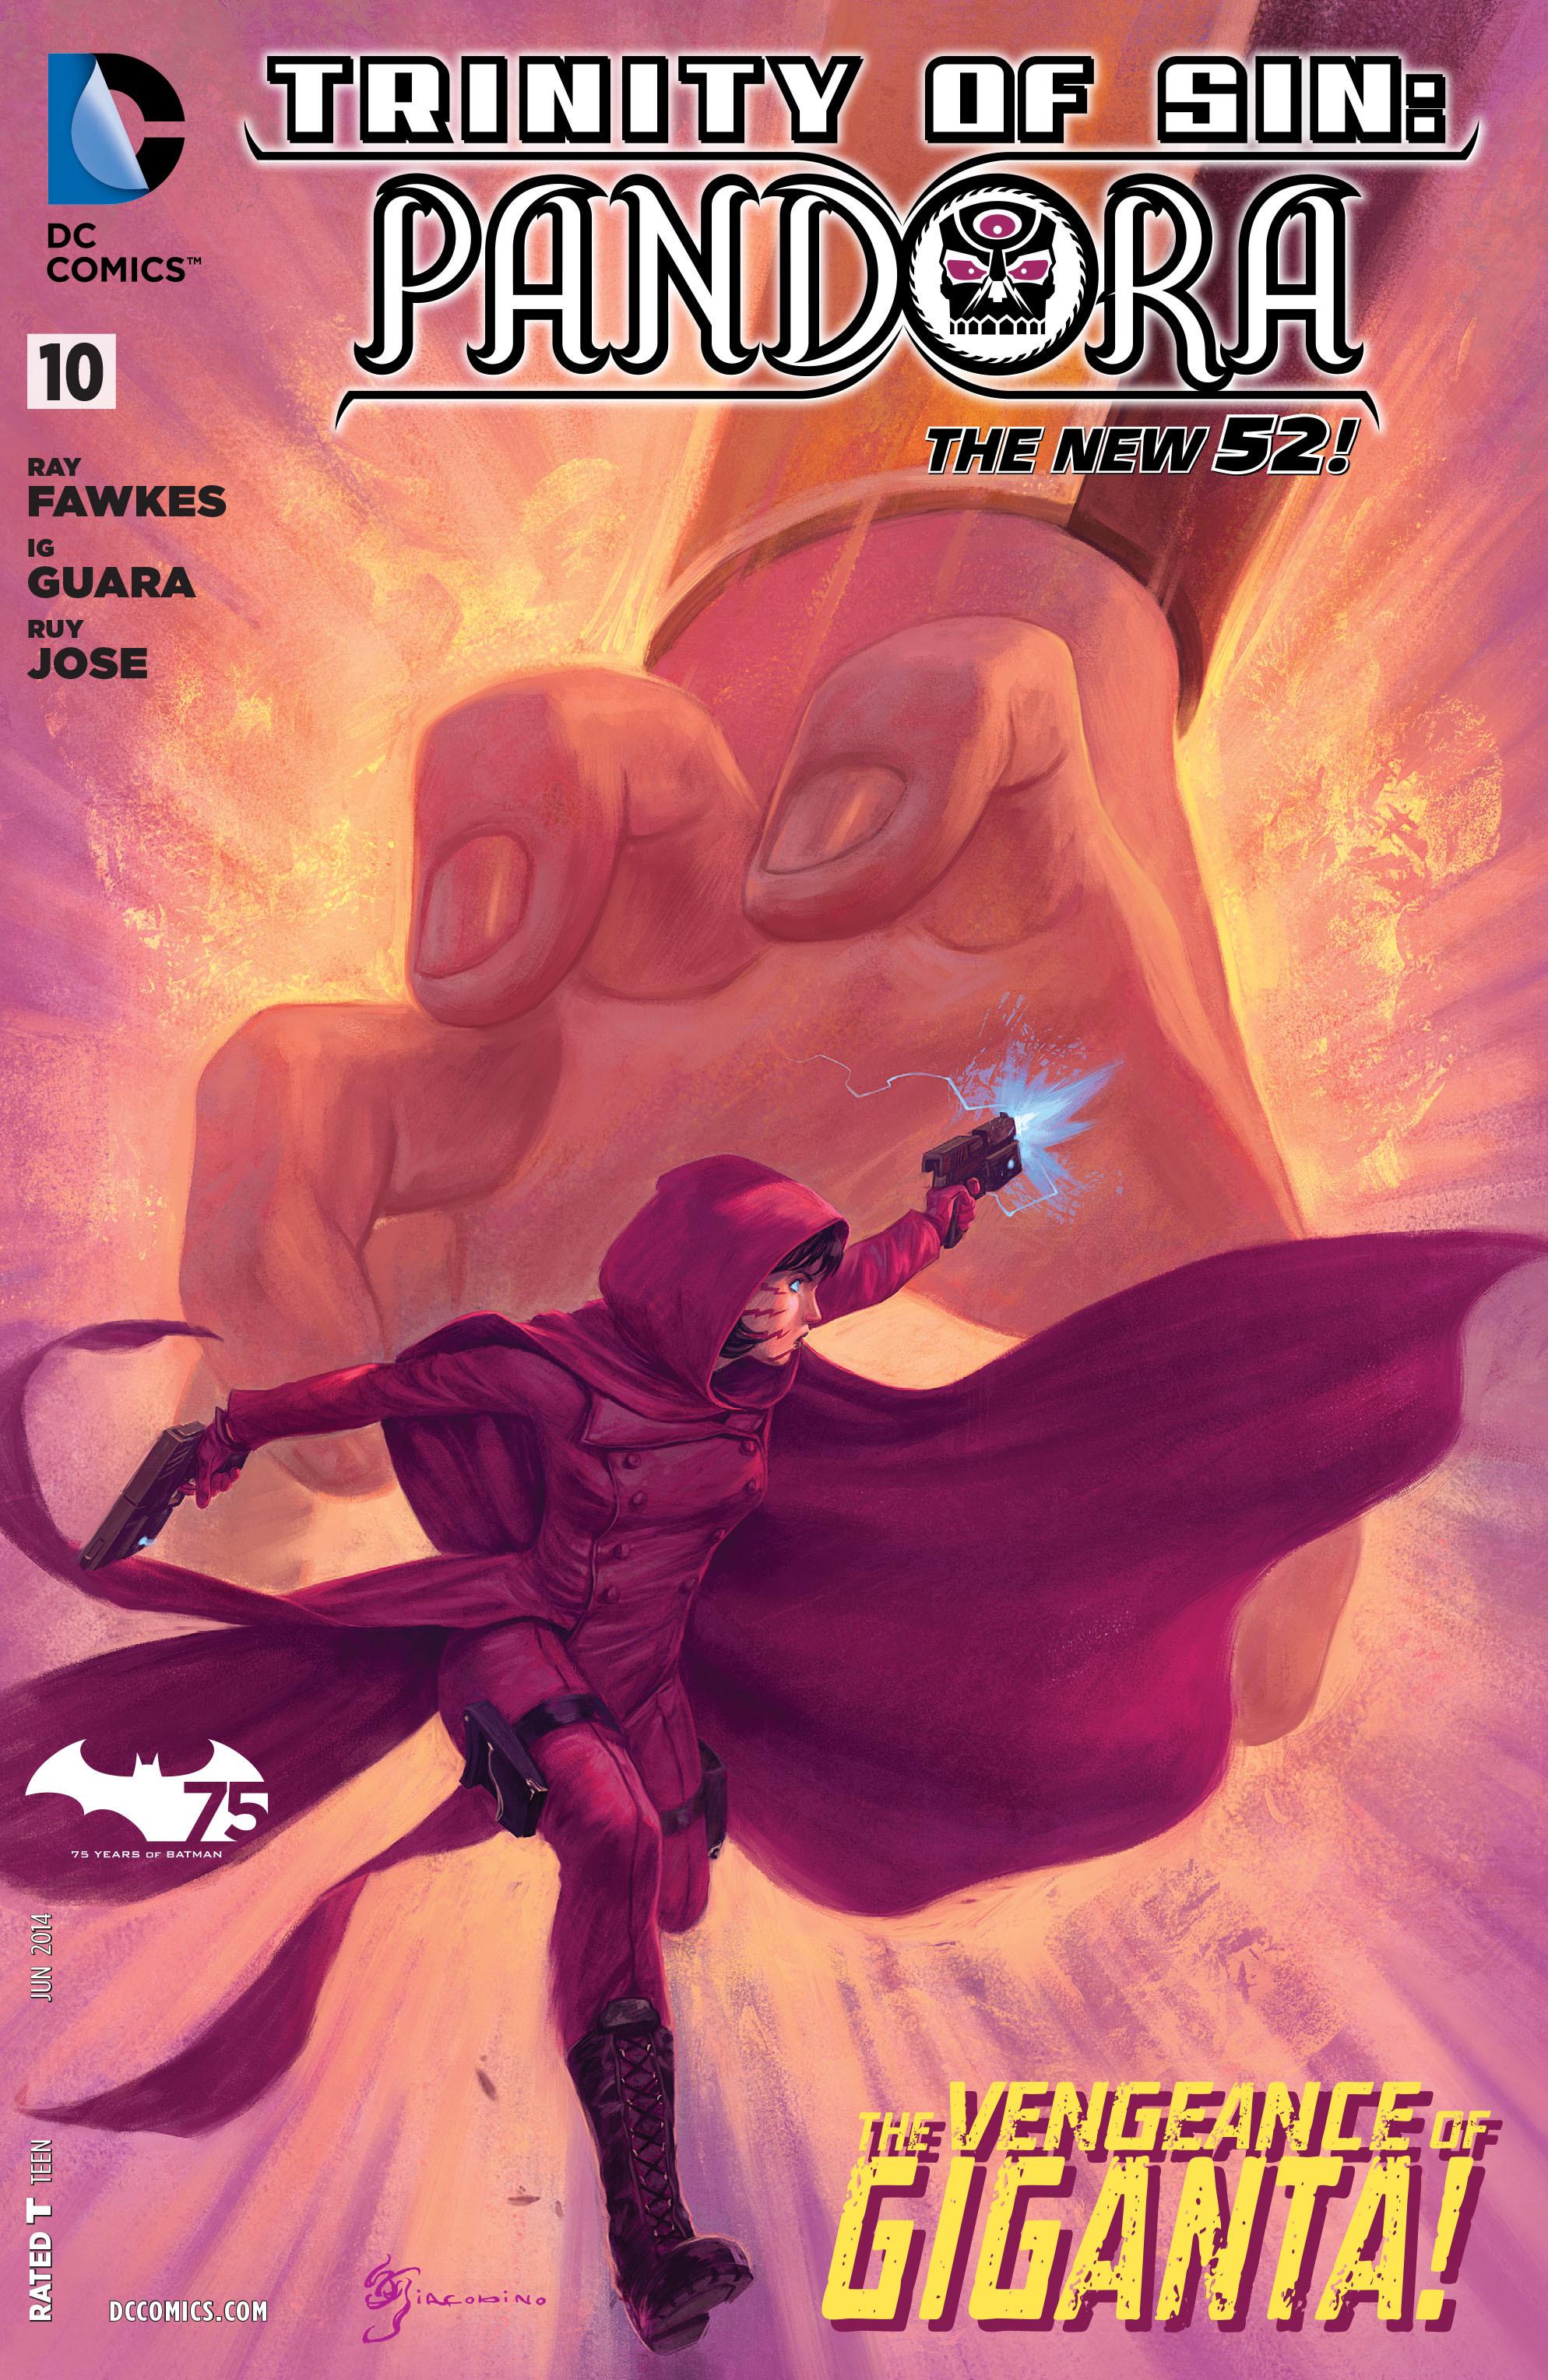 Read online Trinity of Sin: Pandora comic -  Issue #10 - 1